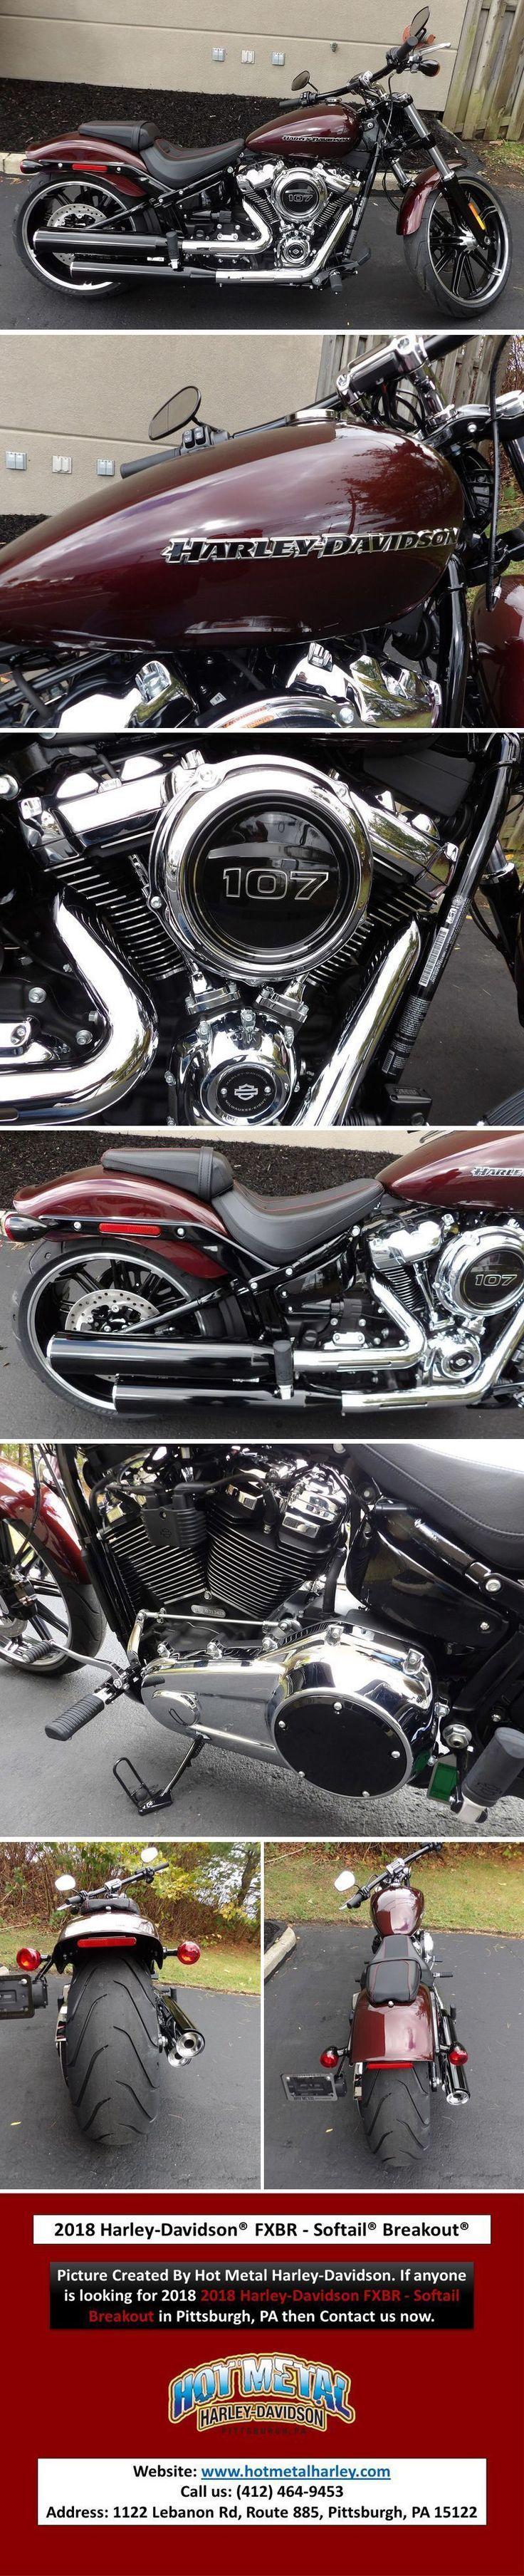 2018 Harley-Davidson FXBR - Softail Breakout  #Harley-Davidson #Harley #Motorcycles #2018-Harley-Davidson #2018-FXBR-Softail-Breakout #2018-Softail-Breakout #Harley-Softail #harelydavidsonbreakout #harleydavidsonsoftailbreakout #harleydavidsonbreakout